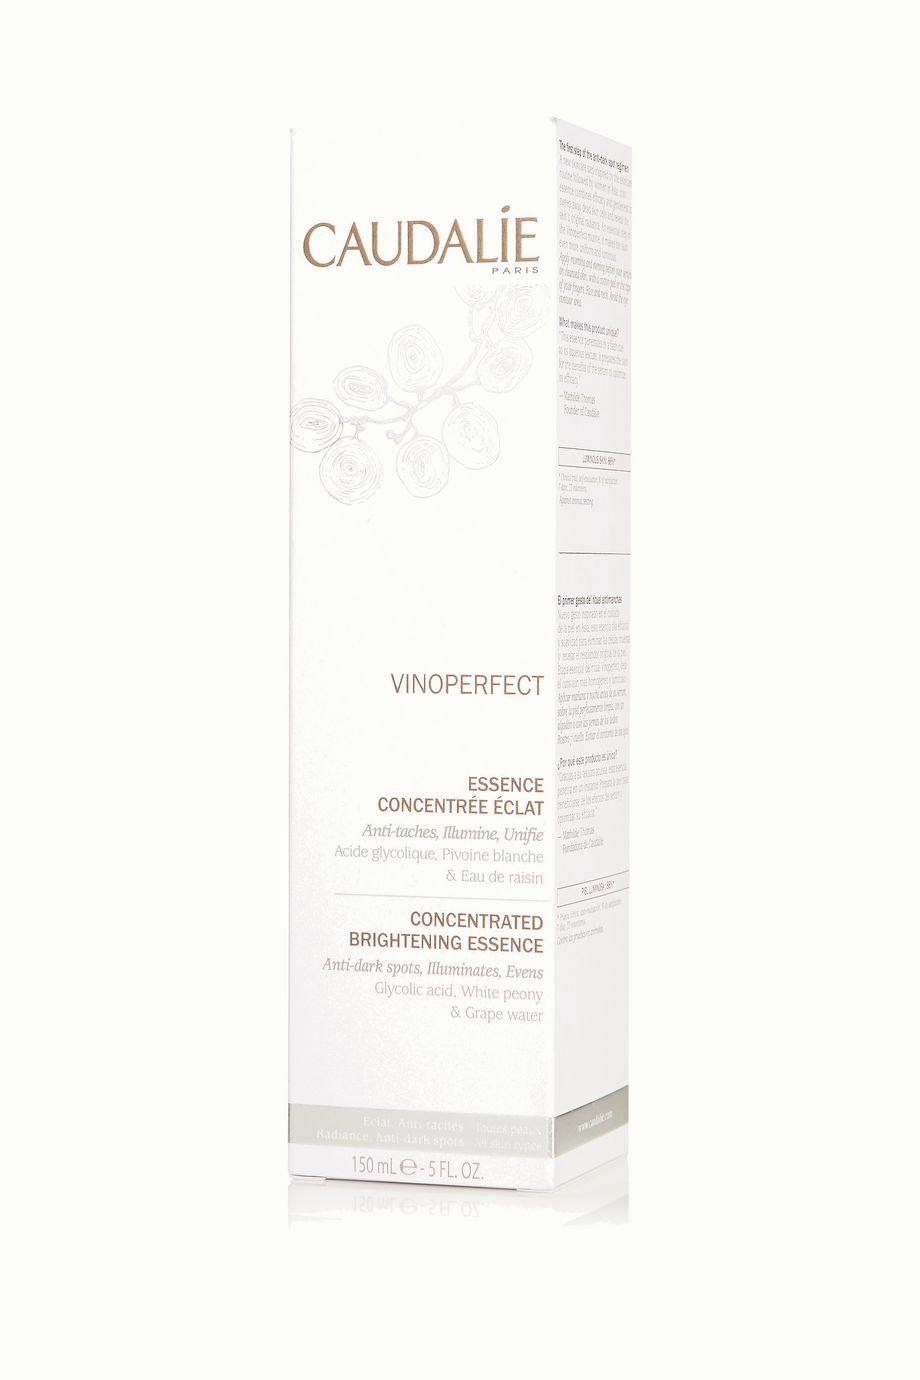 Caudalie Vinoperfect Concentrated Brightening Essence, 150ml